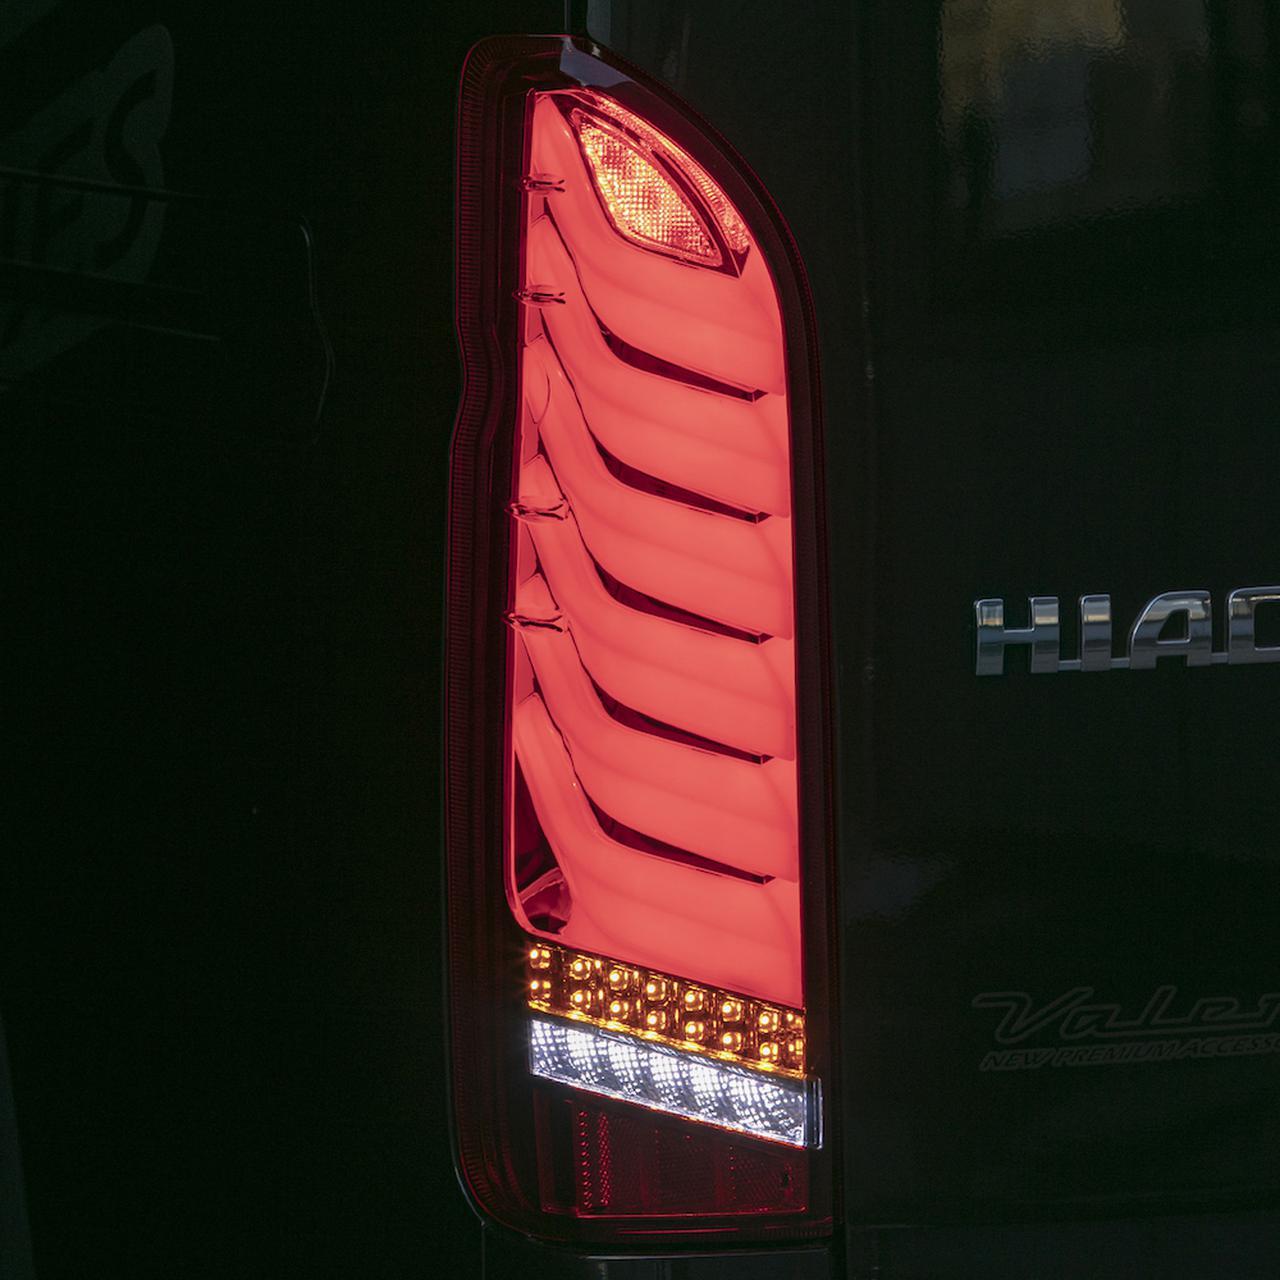 Images : 1番目の画像 - トヨタ ハイエース(200系)用LEDテールランプ - Webモーターマガジン